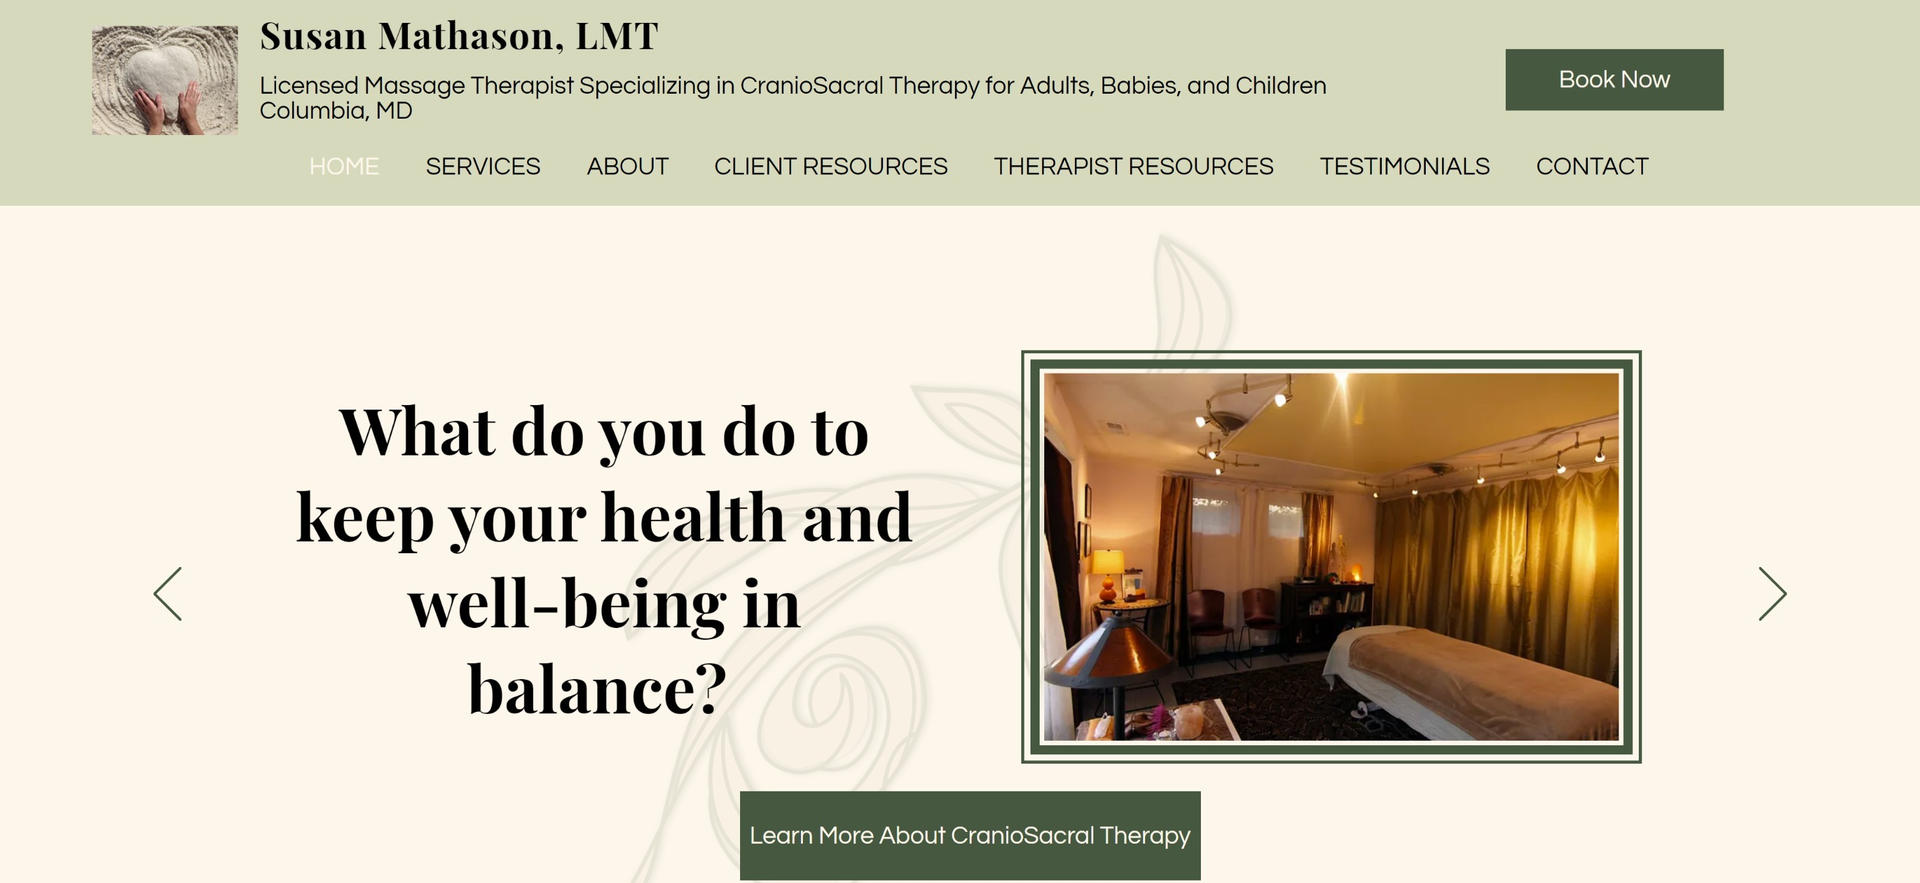 Susan Mathason, Licensed Massage Therapist